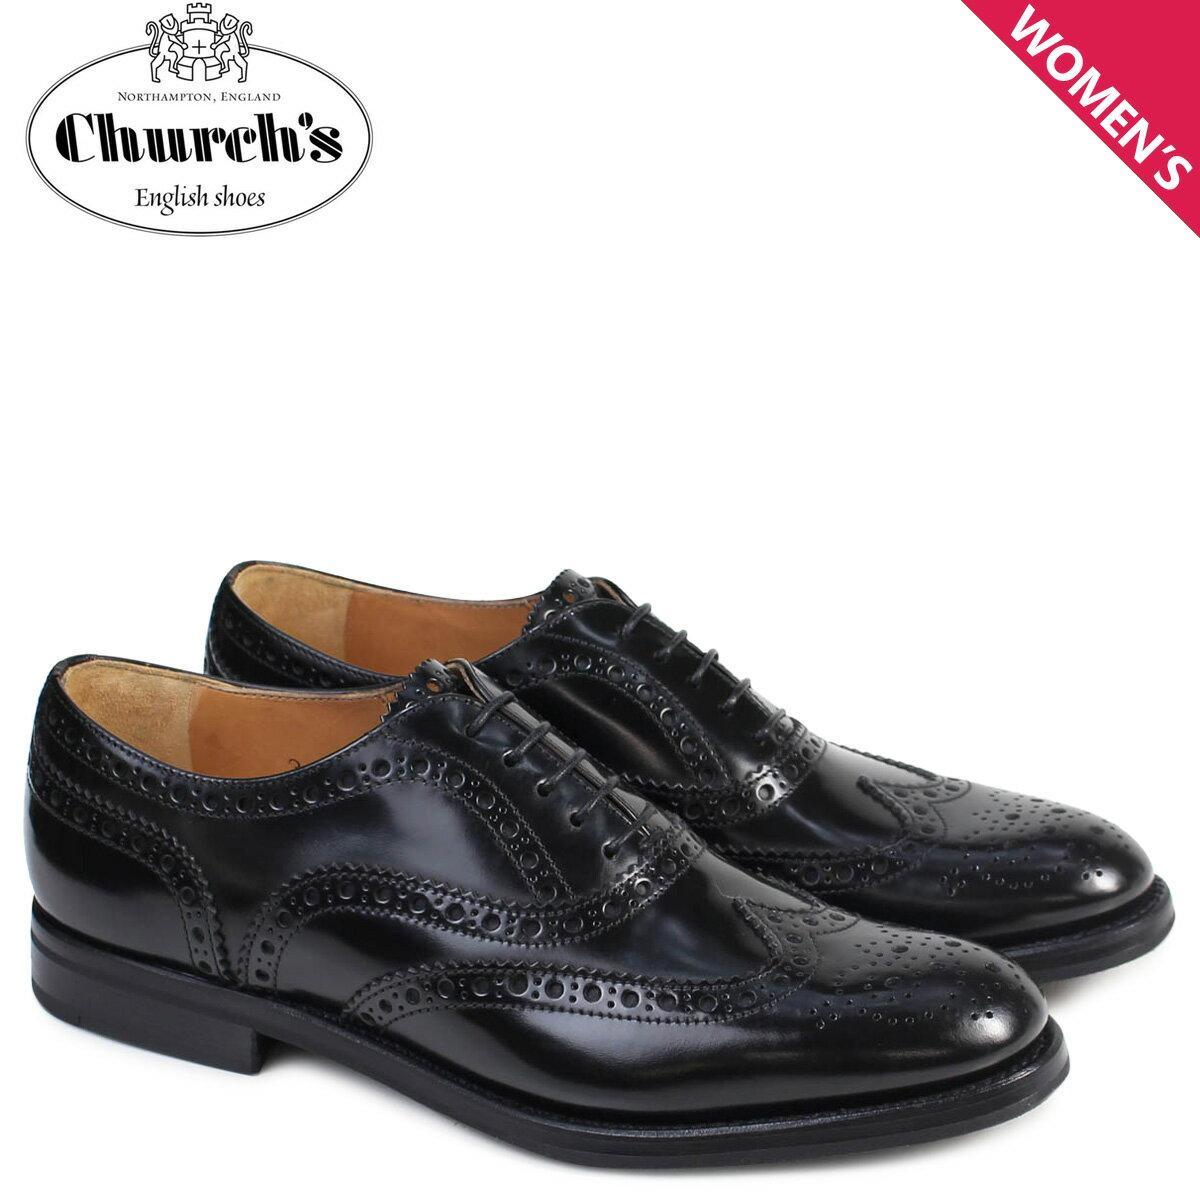 Churchs Burwood WG Polish Binder Calf 靴 レディース チャーチ バーウッド シューズ ウイングチップ 8705 DE0001 ブラック [12/21 再入荷]